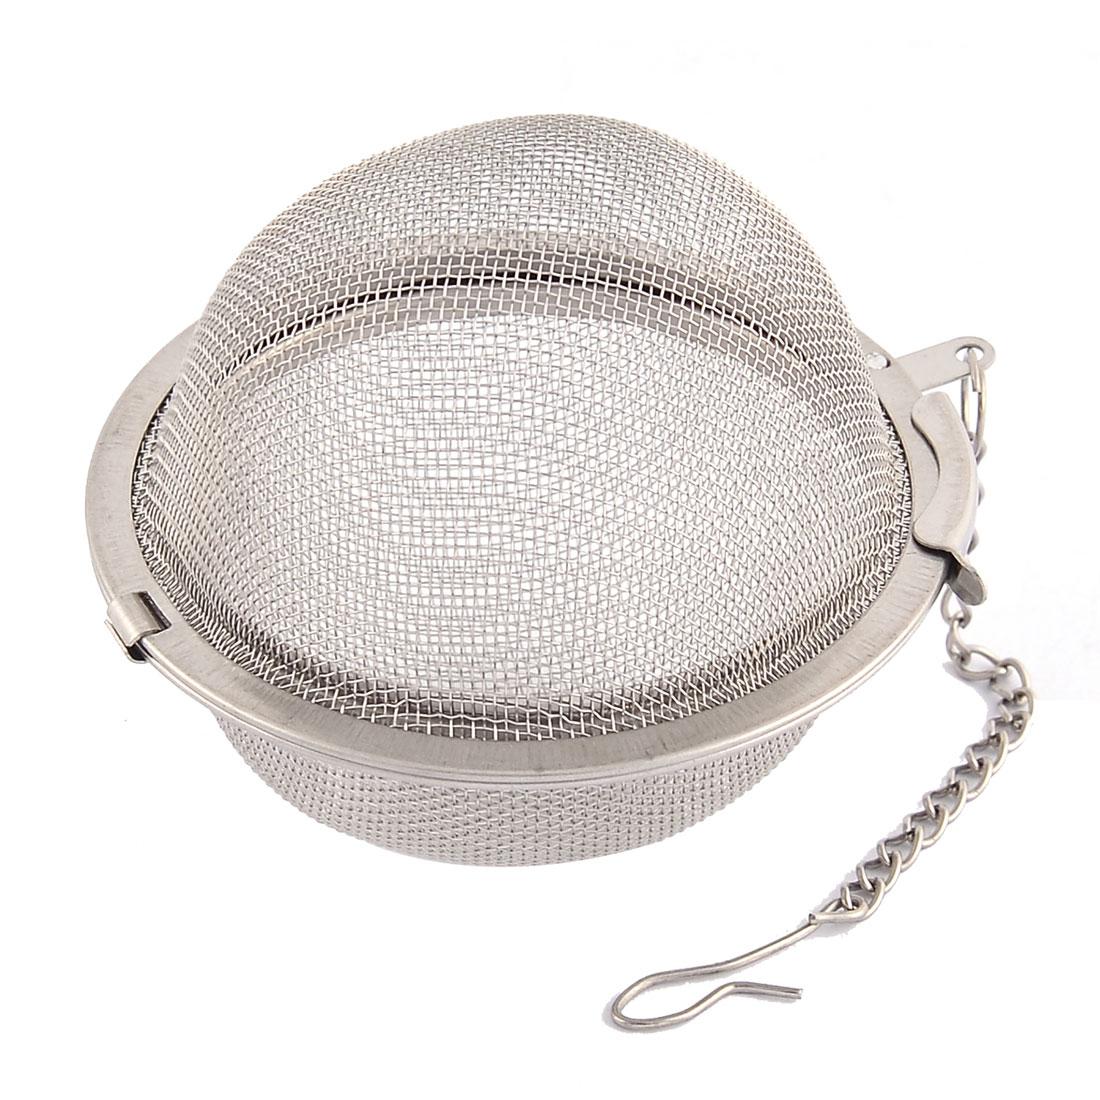 Household 304 Stainless Steel Locking Chain Mesh Tea Ball Strainer Infuser 1.6'' Dia